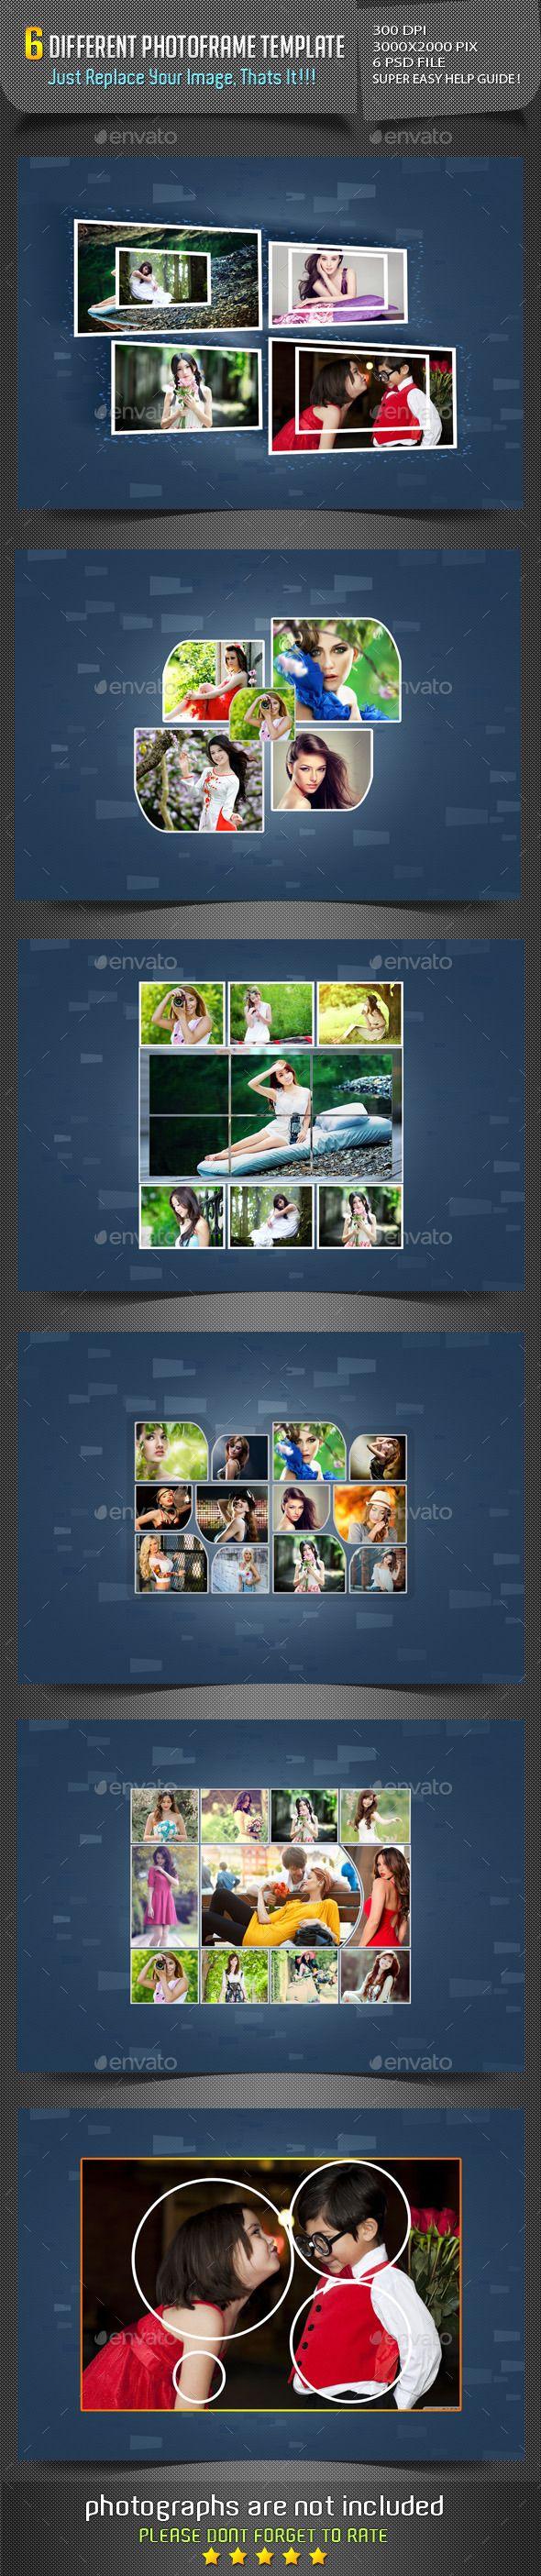 Different Photo Frame Templates #design Download: http://graphicriver.net/item/different-photo-frame-templates-/12020942?ref=ksioks